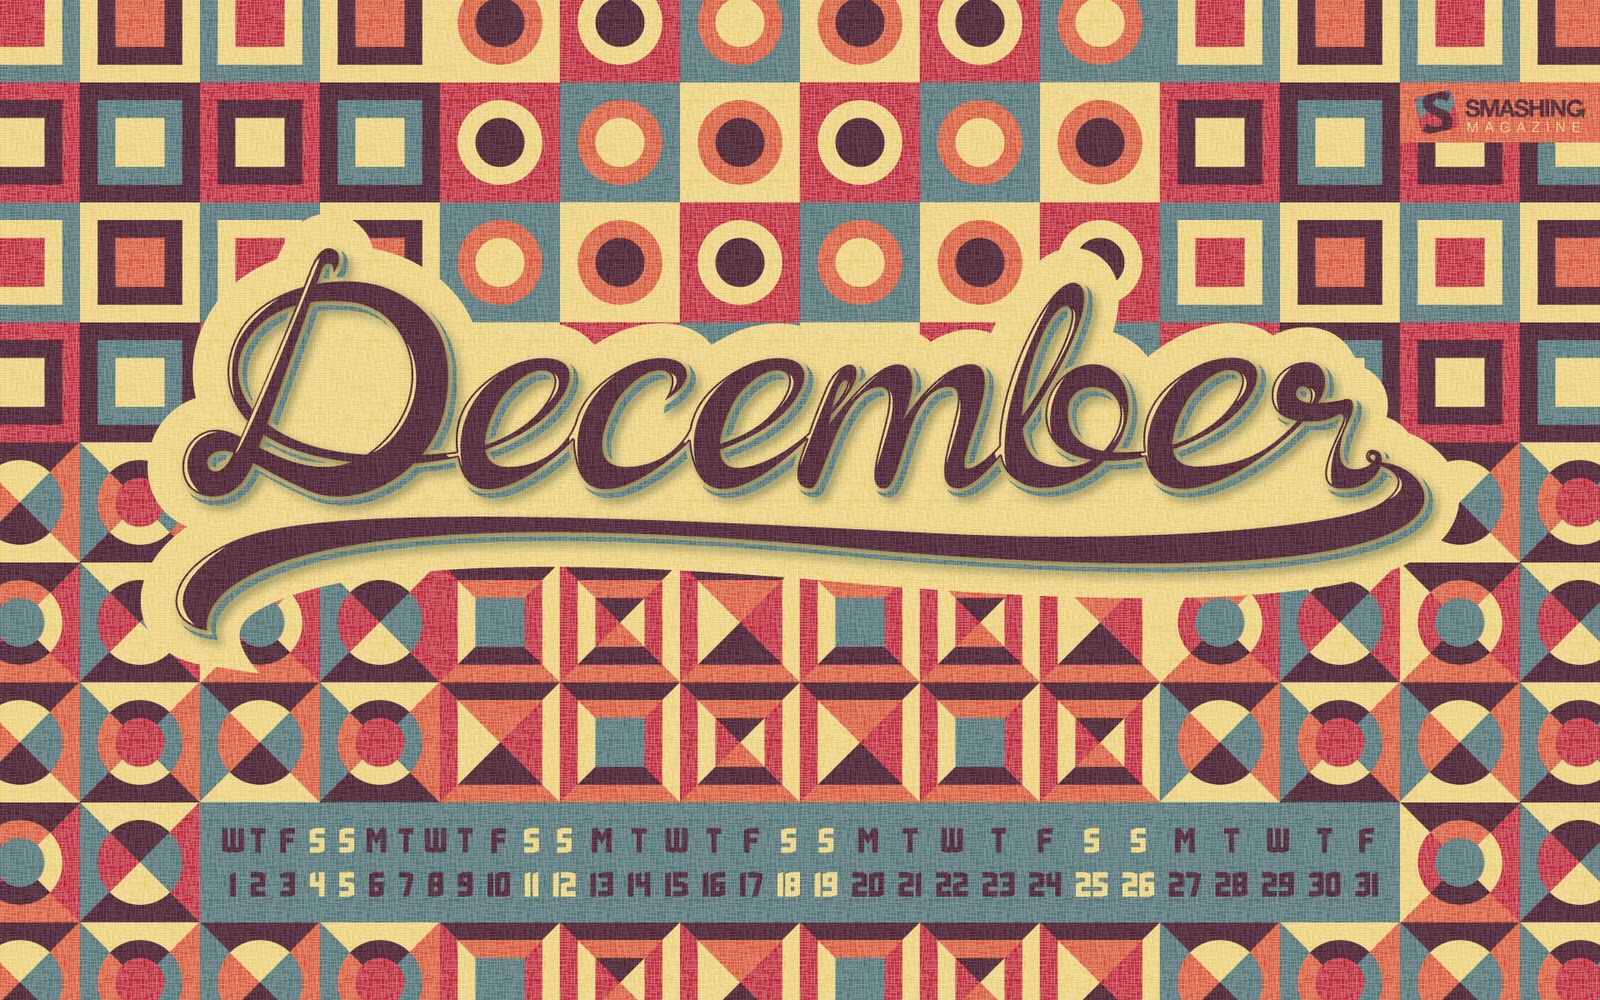 http://3.bp.blogspot.com/_AwBOvupXiW4/TQi1nVzsQlI/AAAAAAAADv8/6oL6w_Bc9nk/s1600/december-10-cosy_retro__54-calendar-1920x1200.jpg